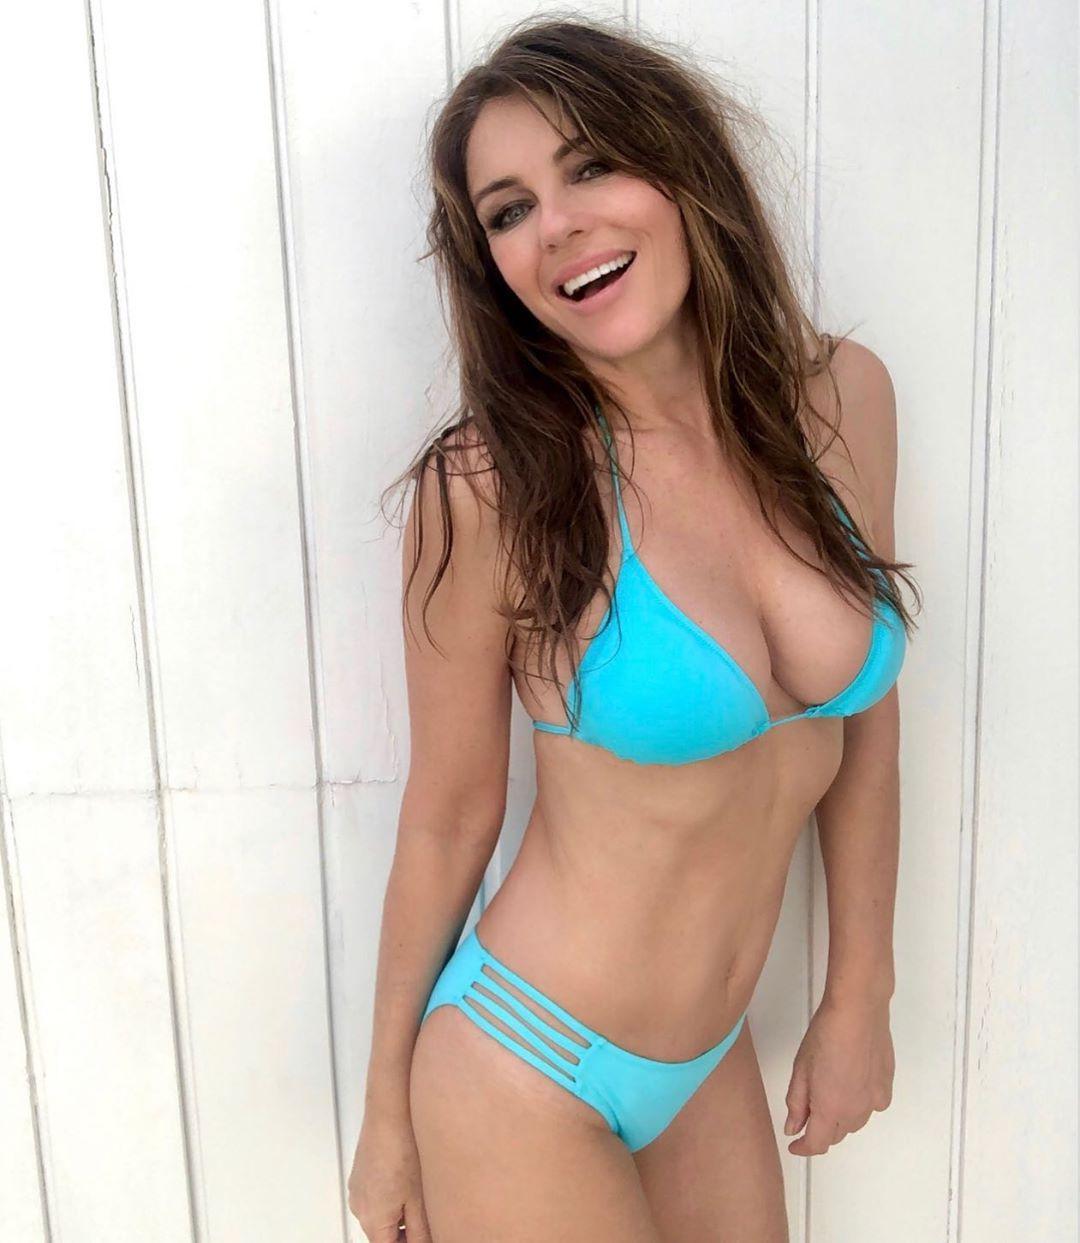 Elizabeth hurley bikini photo gallery